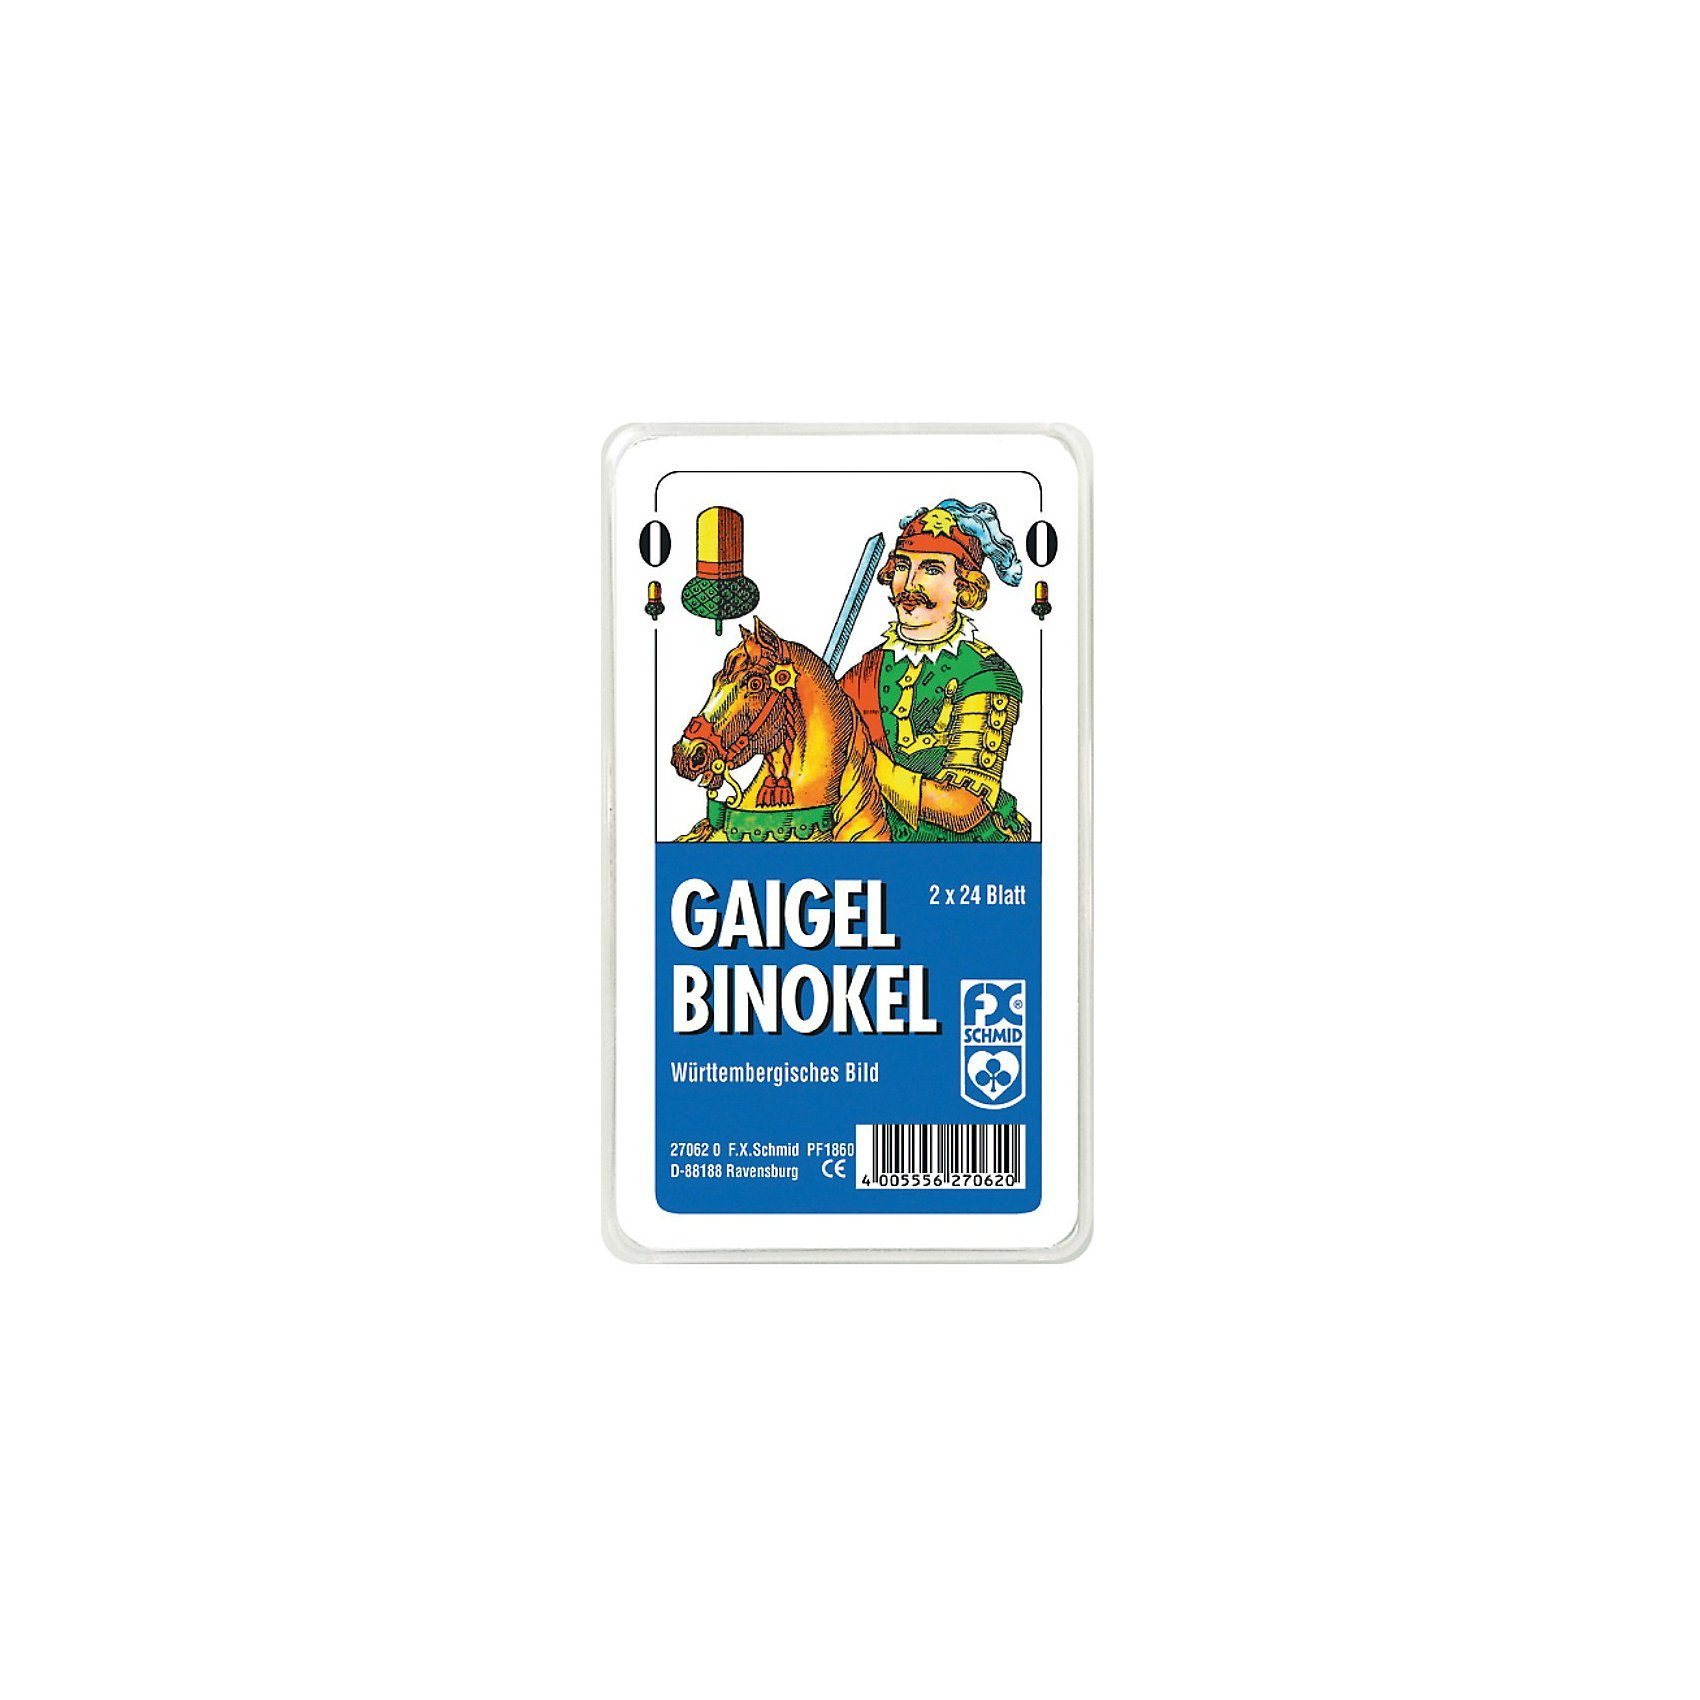 Ravensburger Gaigel/Binokel, württembergisches Bild